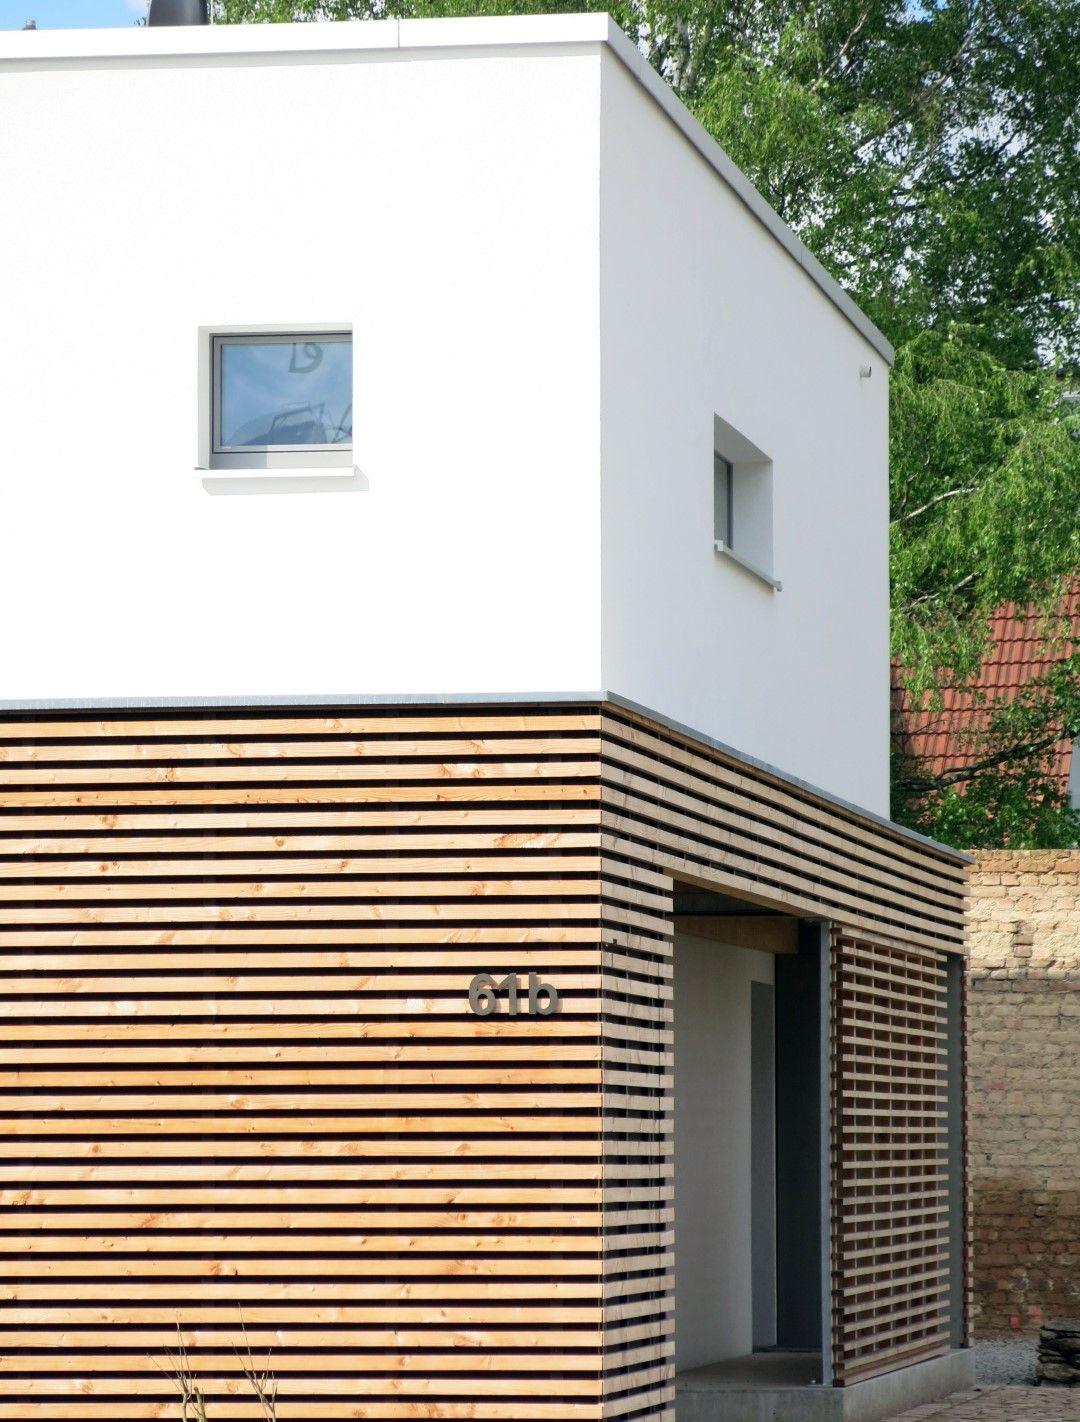 Holzfassaden  klassisch, modern, zeitlos | Fassaden ...